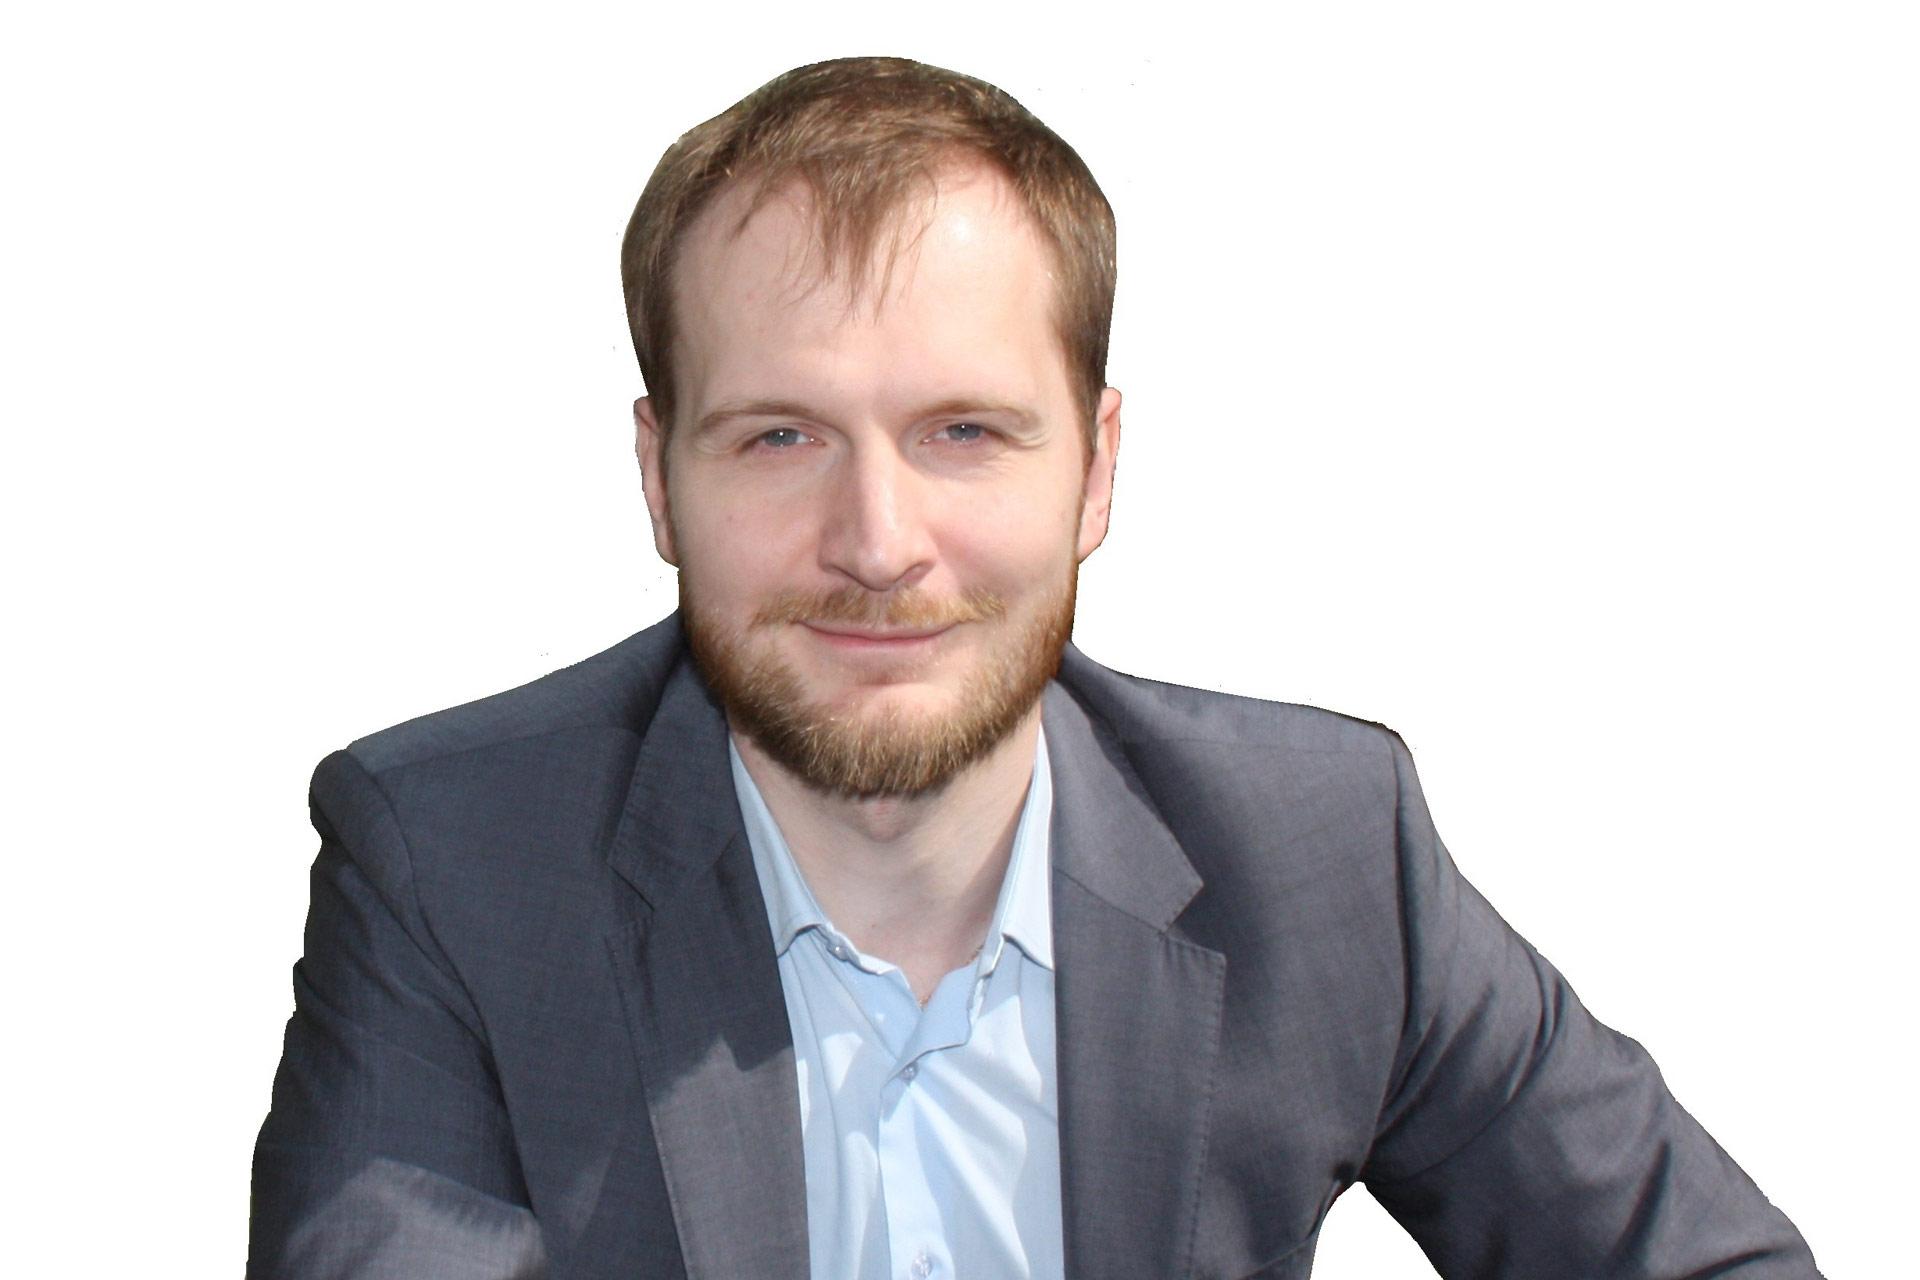 Александр Багулин — эксперт в области HR технологий и развития корпоративной культуры